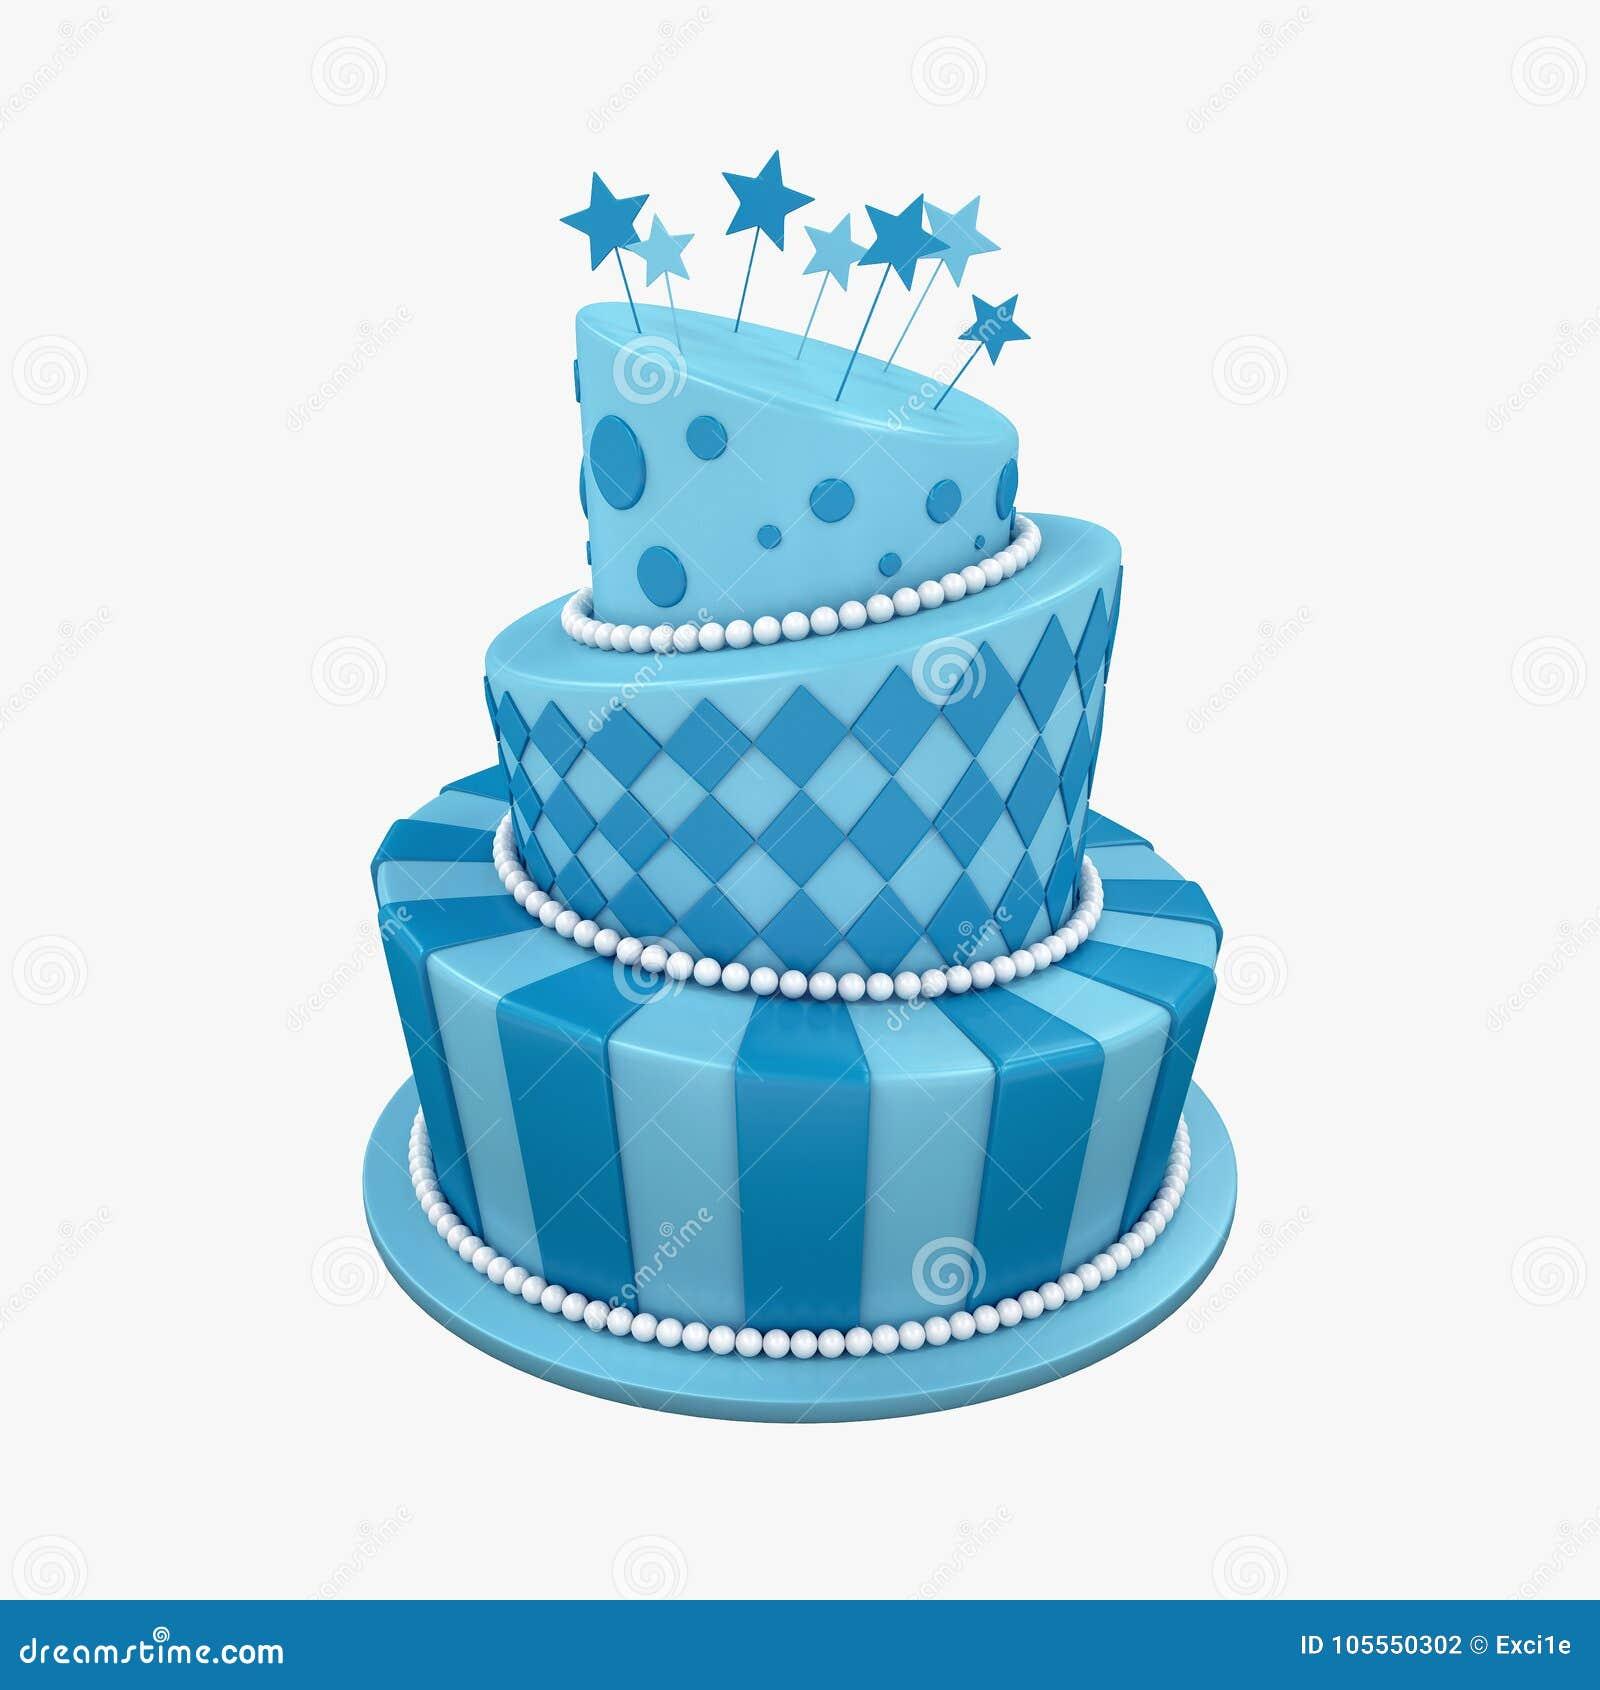 3d Illustration Of Big Birthday Holiday Three Floor Cake